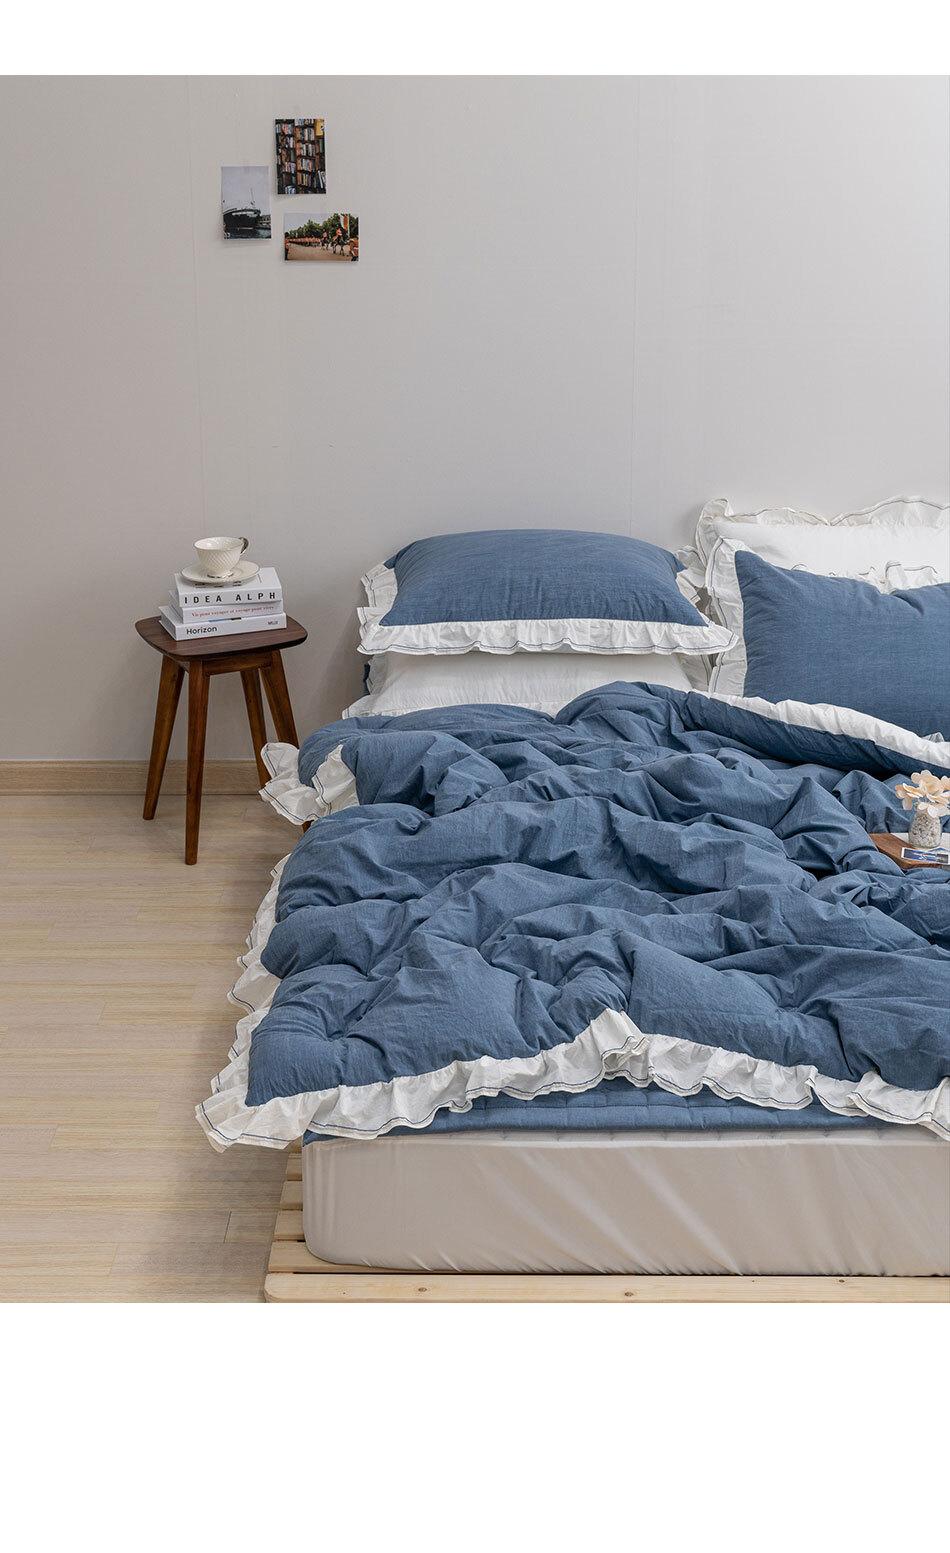 stay_bed_blue5.jpg